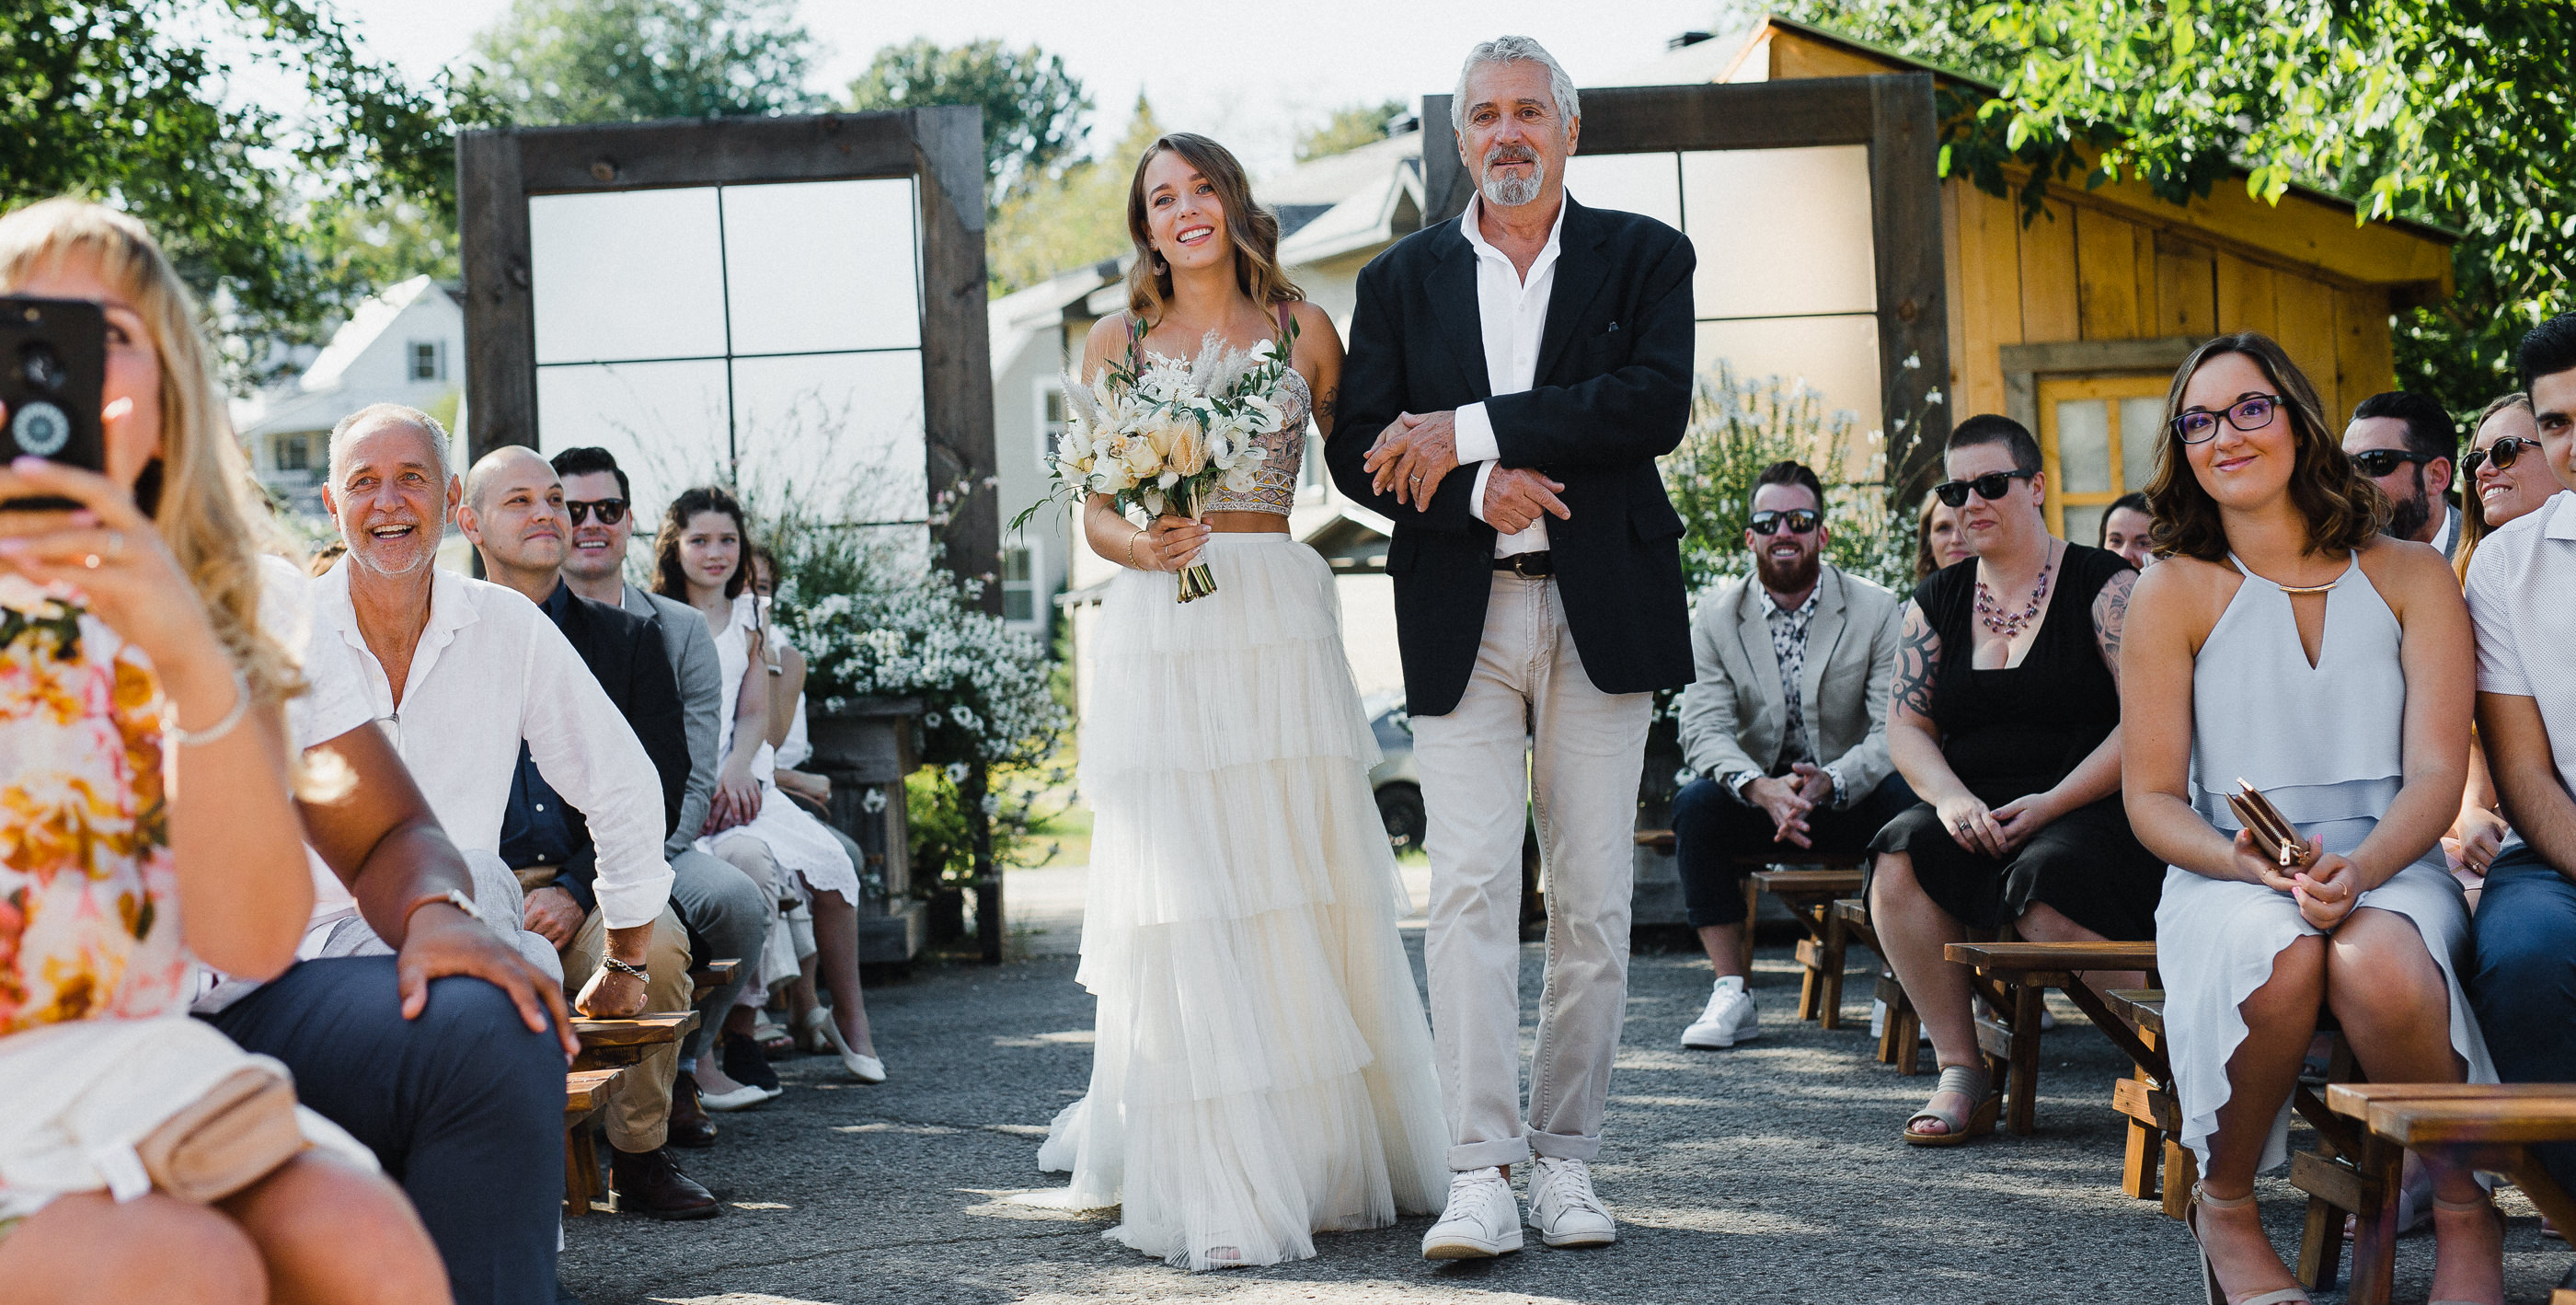 portfolio-photographies-de-mariage-sonia-bourdon-024